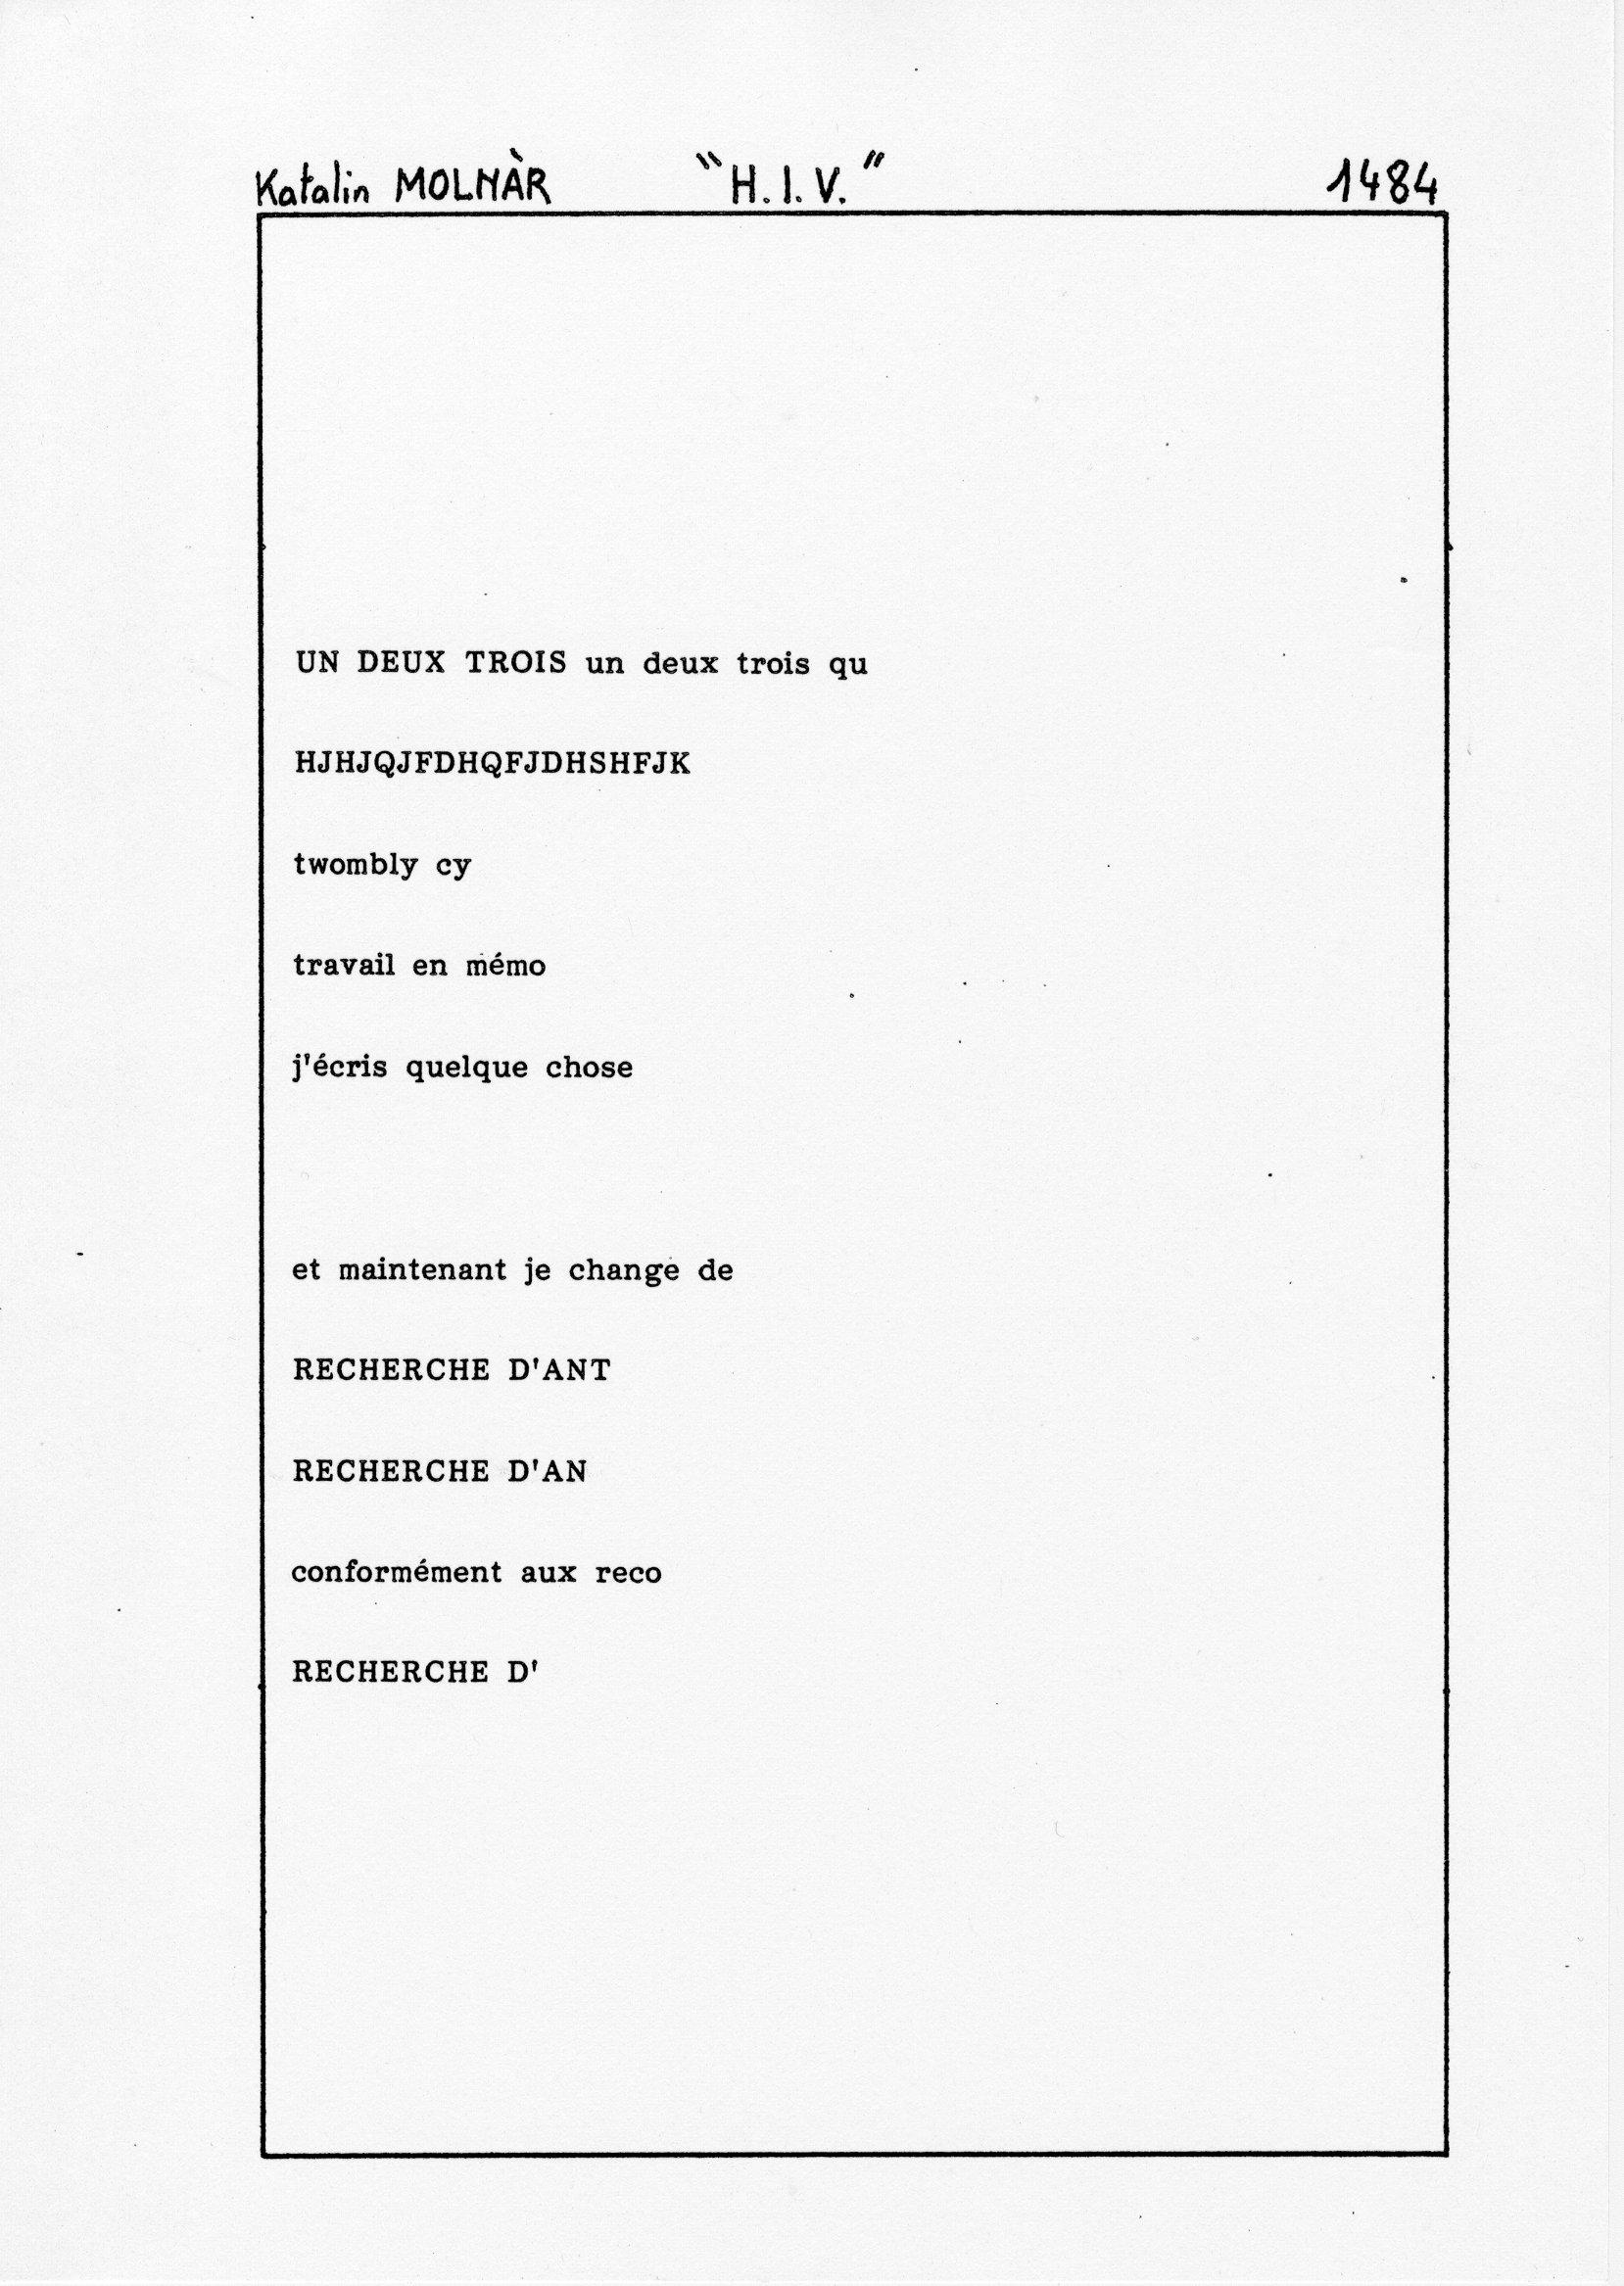 page 1484 K. Molnar H.I.V.